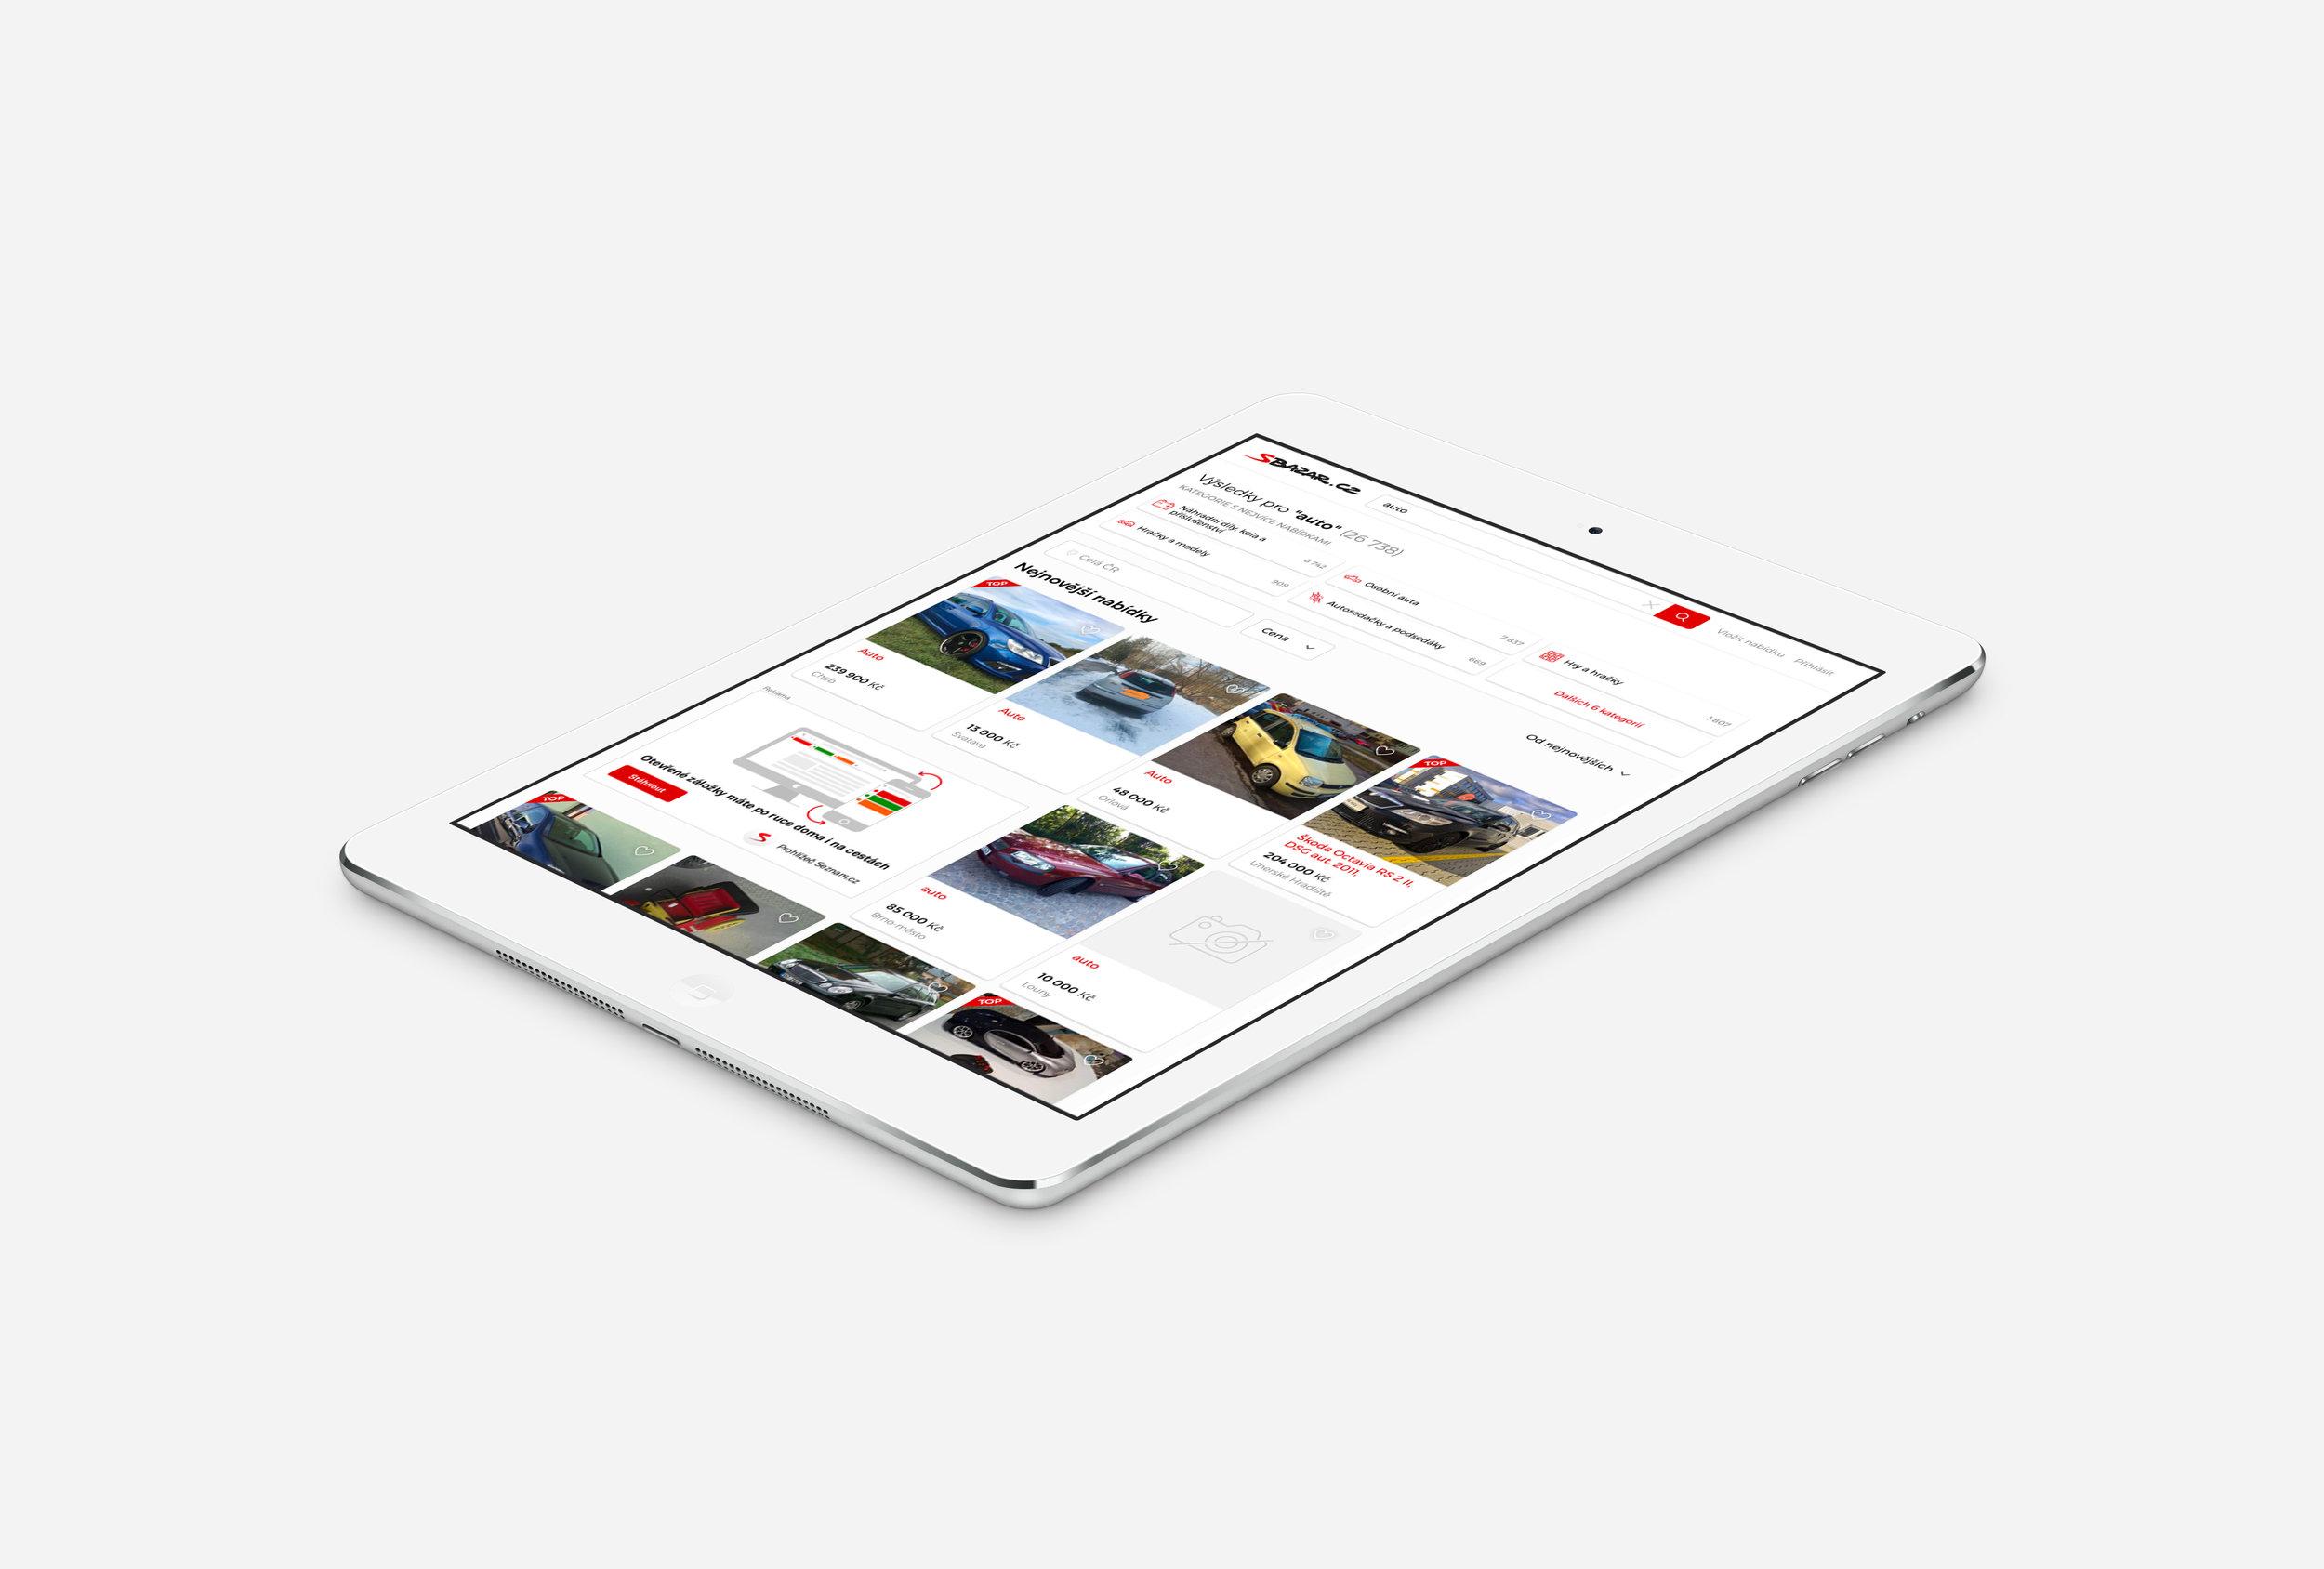 08 TABLET 02-Isometric-iPad-Air-Silver-Mock-up.jpg